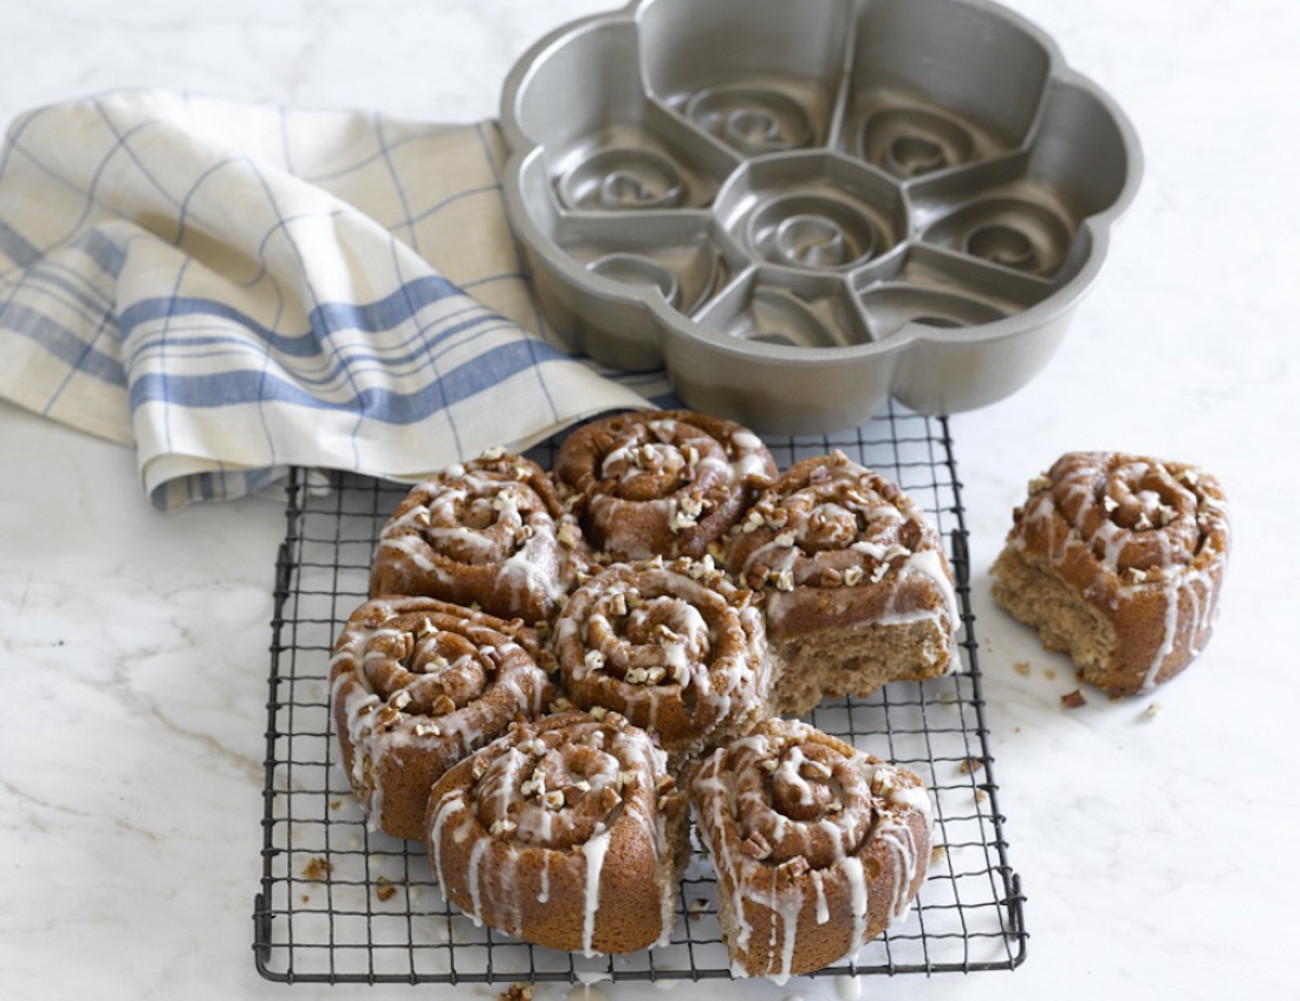 cinnamon-bun-pan-by-nordic-ware-02